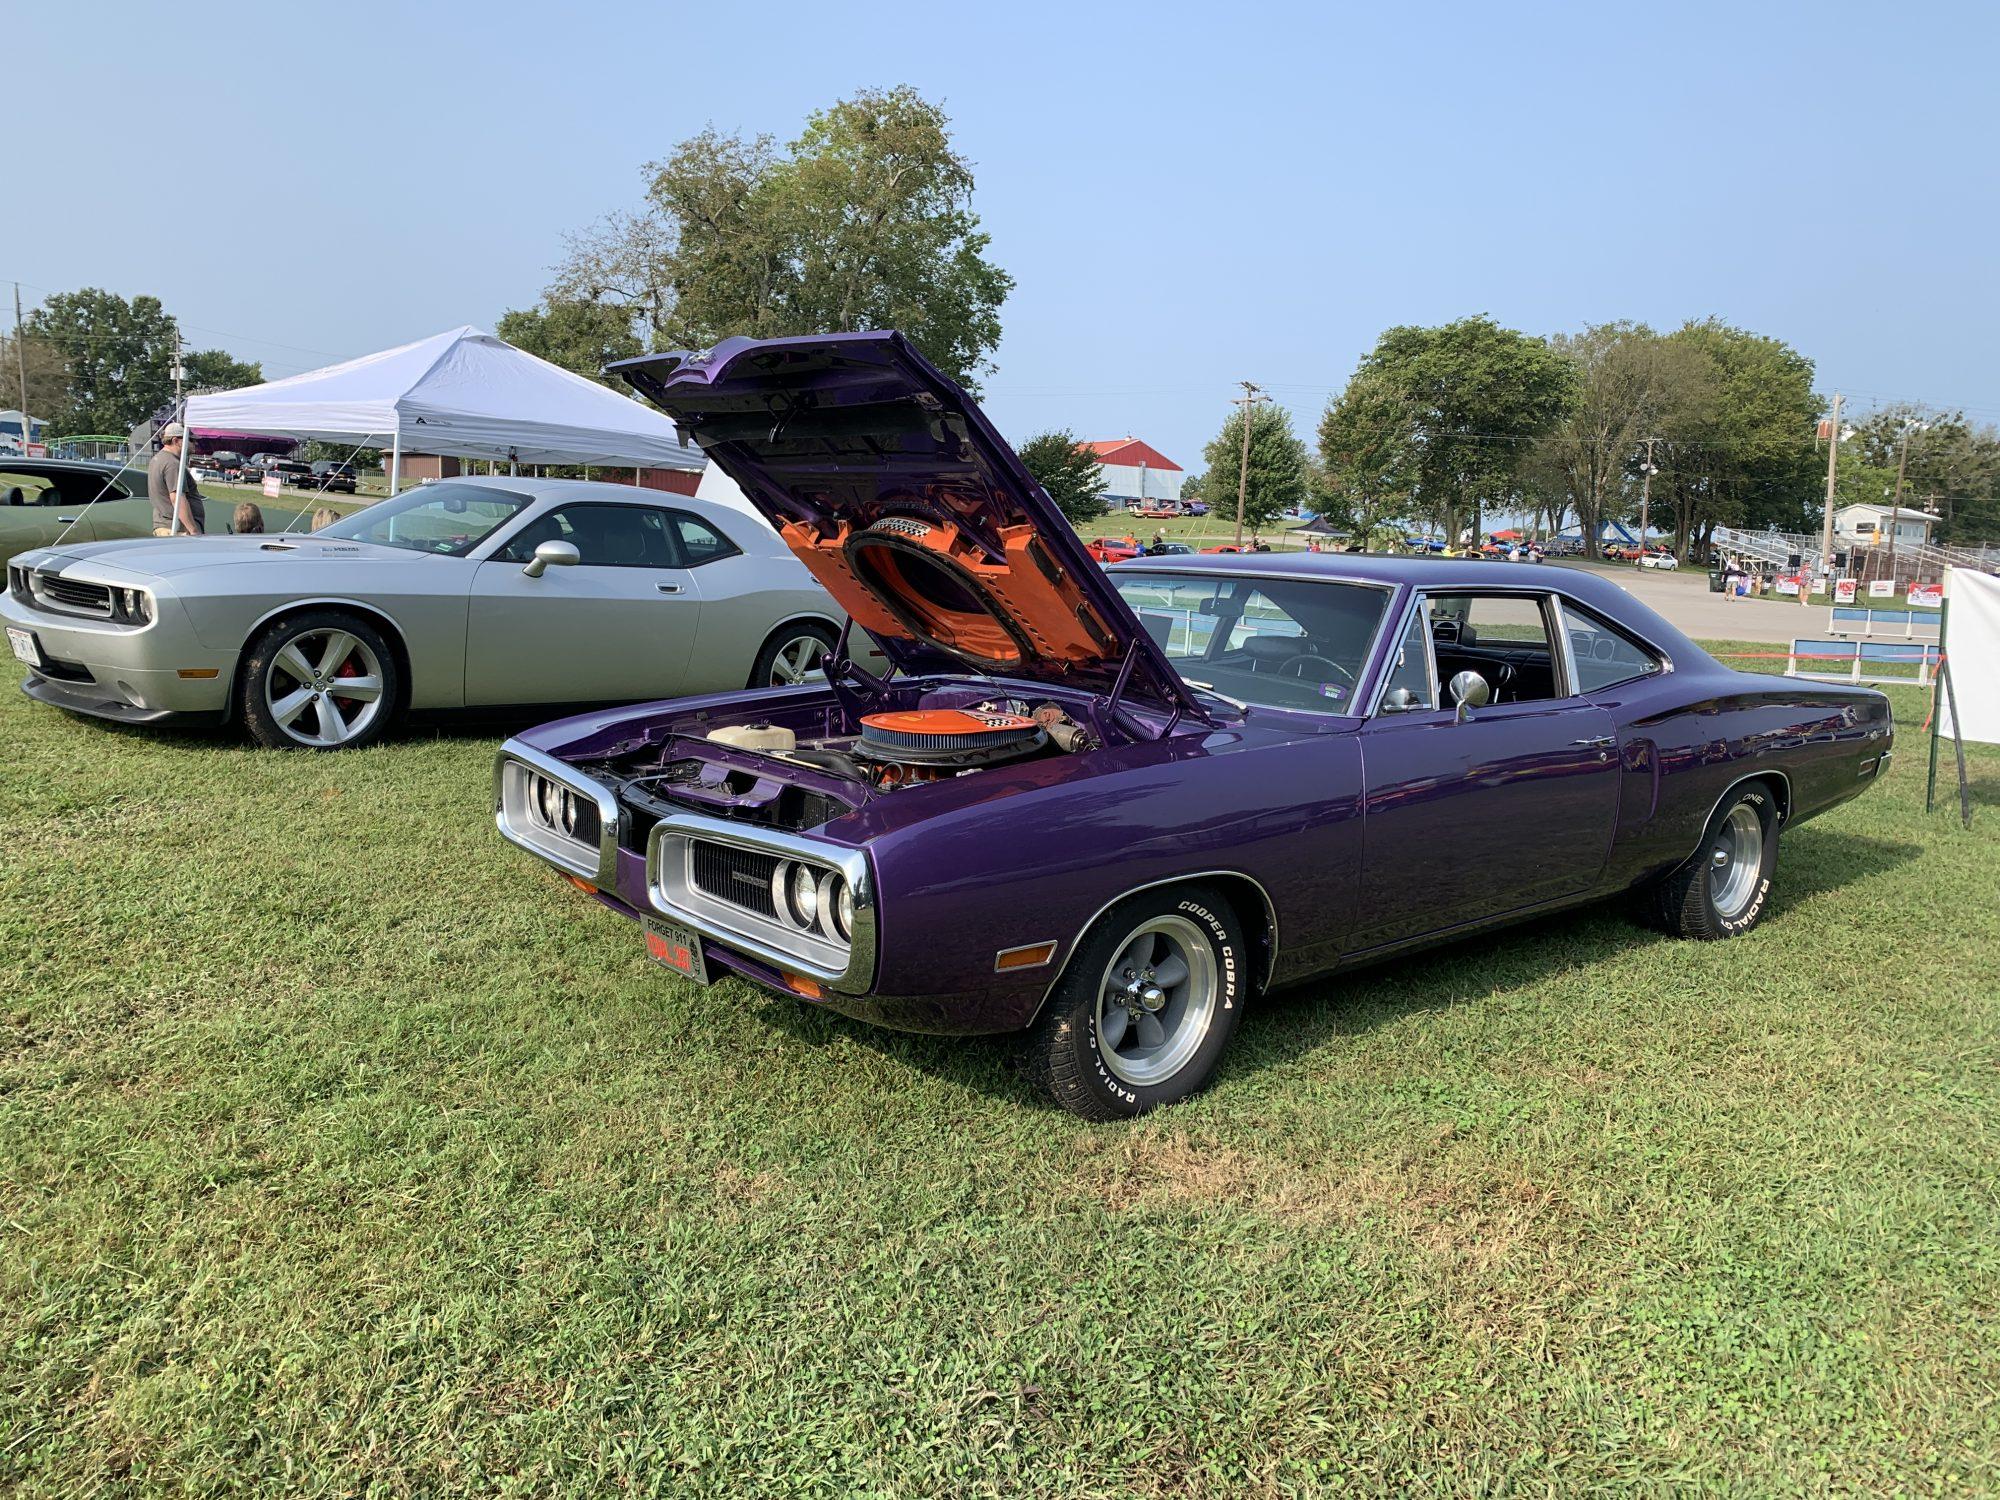 Classic Dodge on display